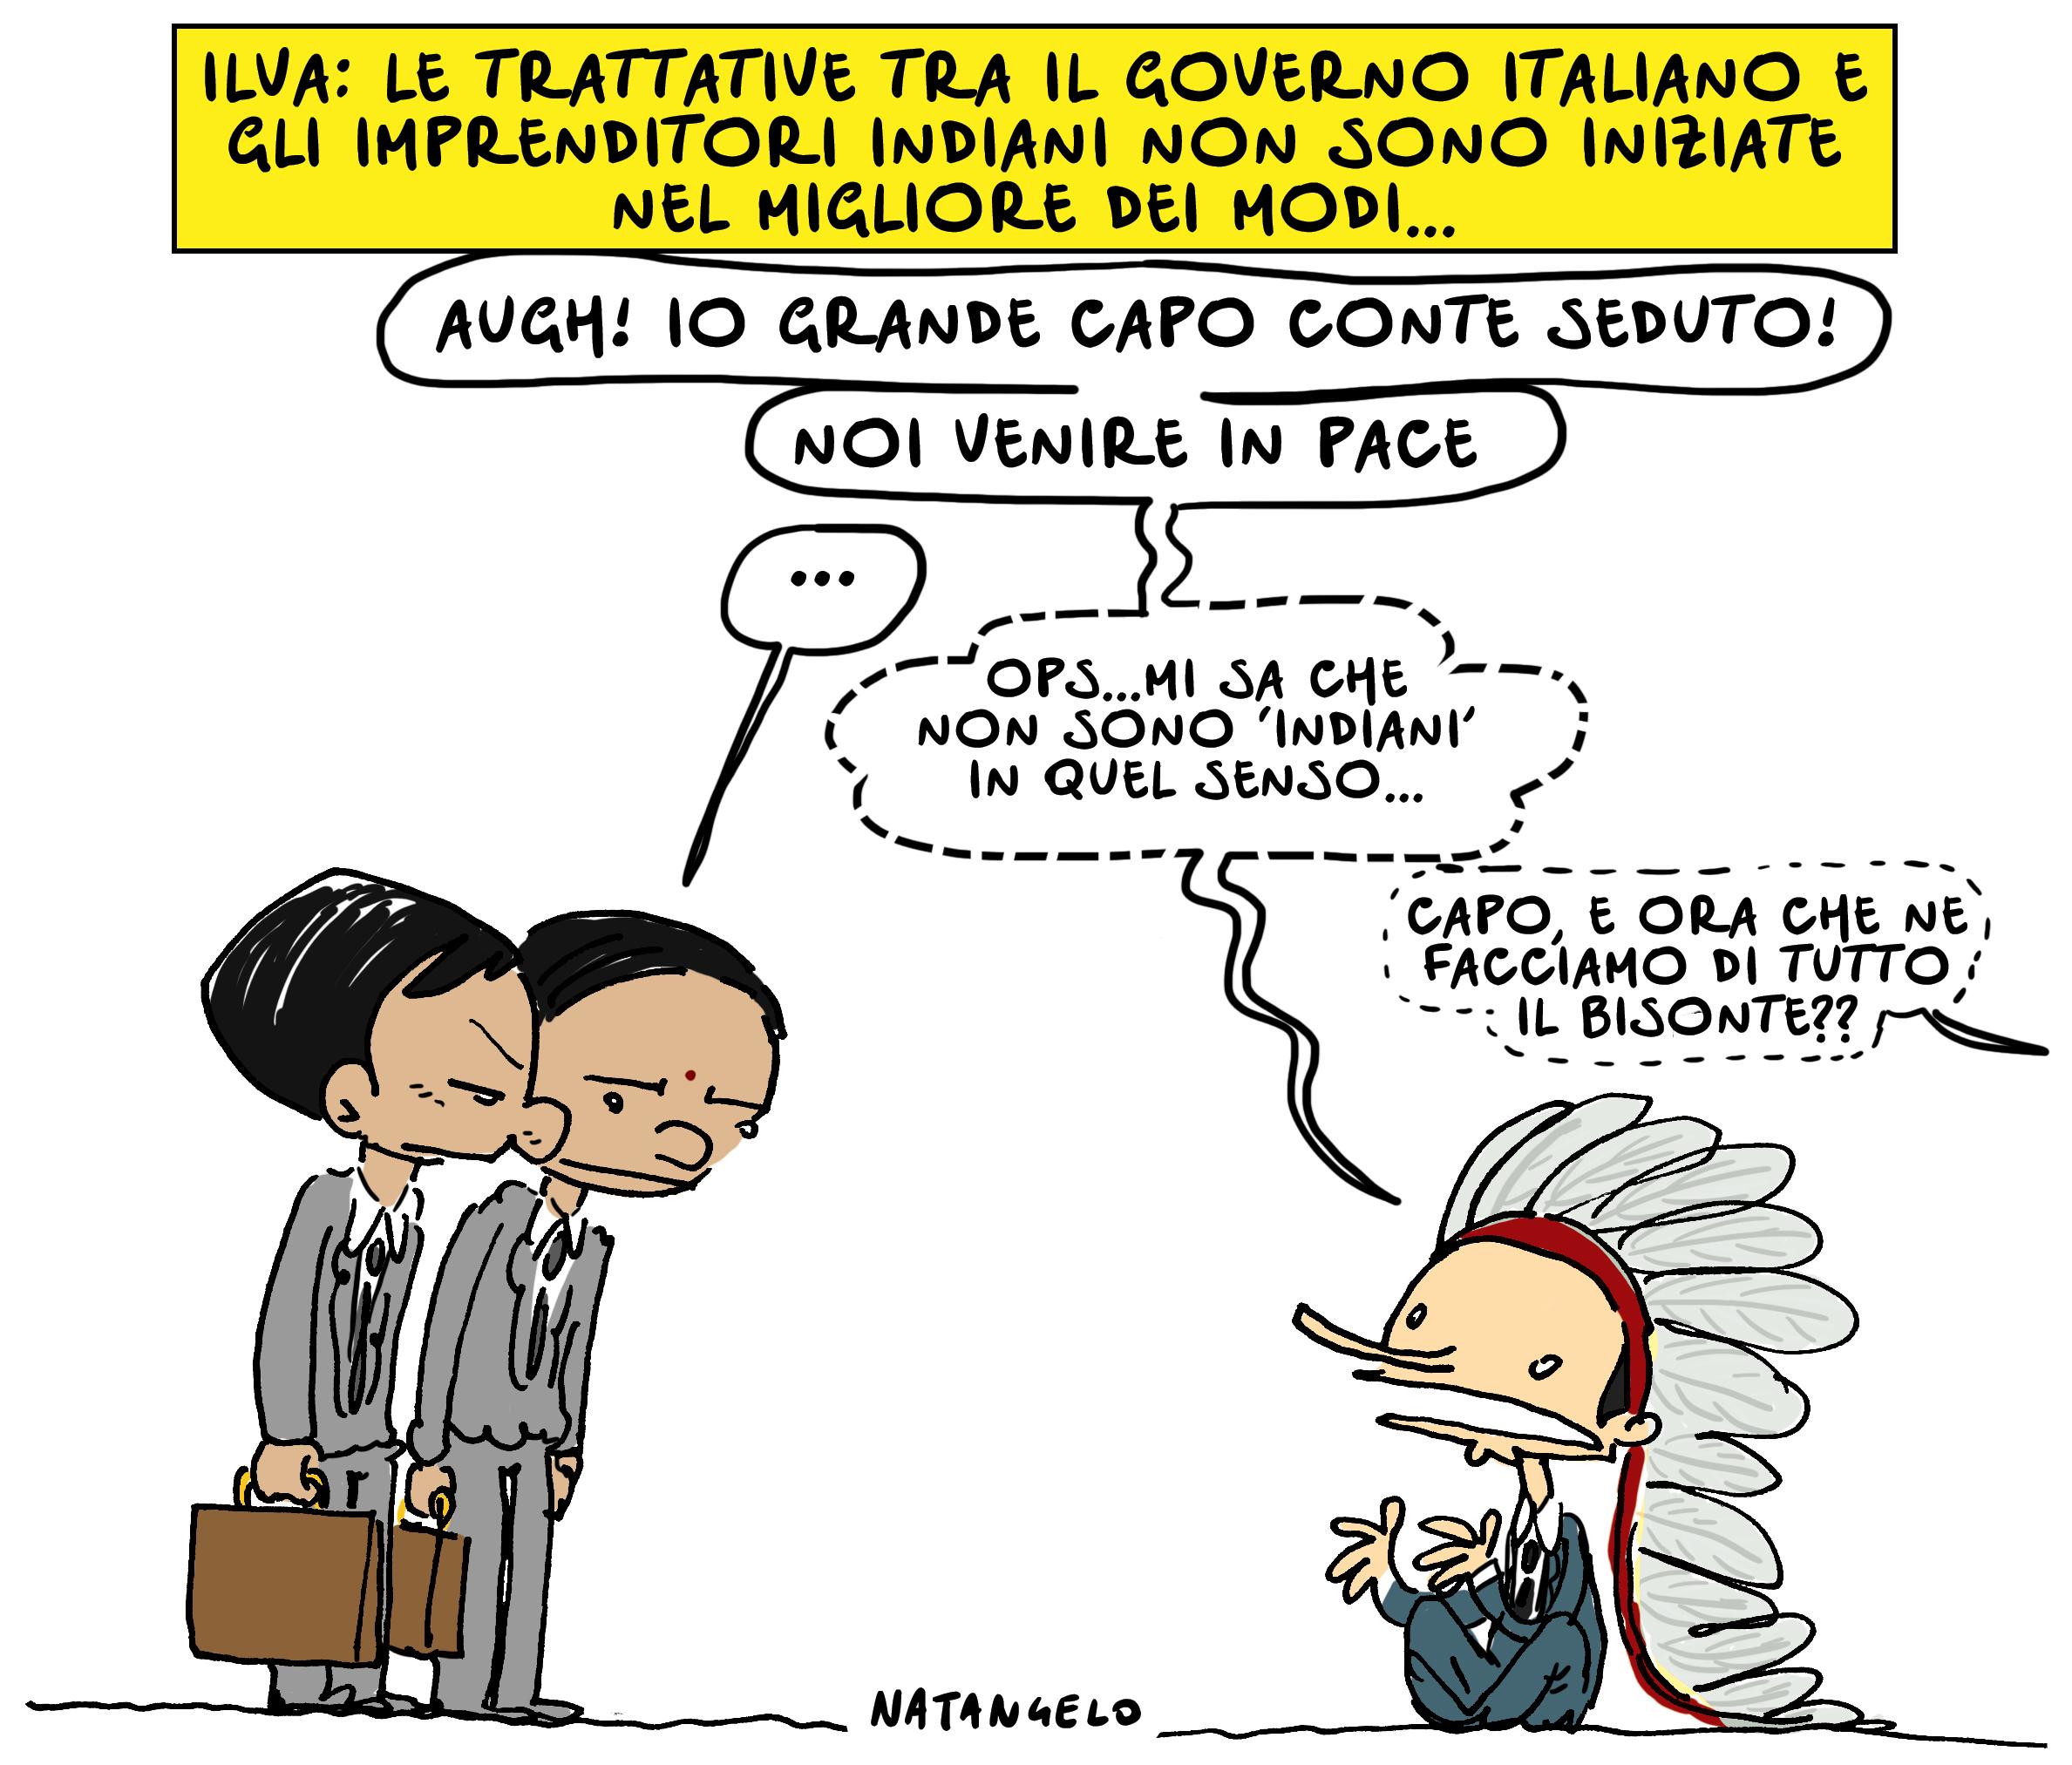 Conte Seduto